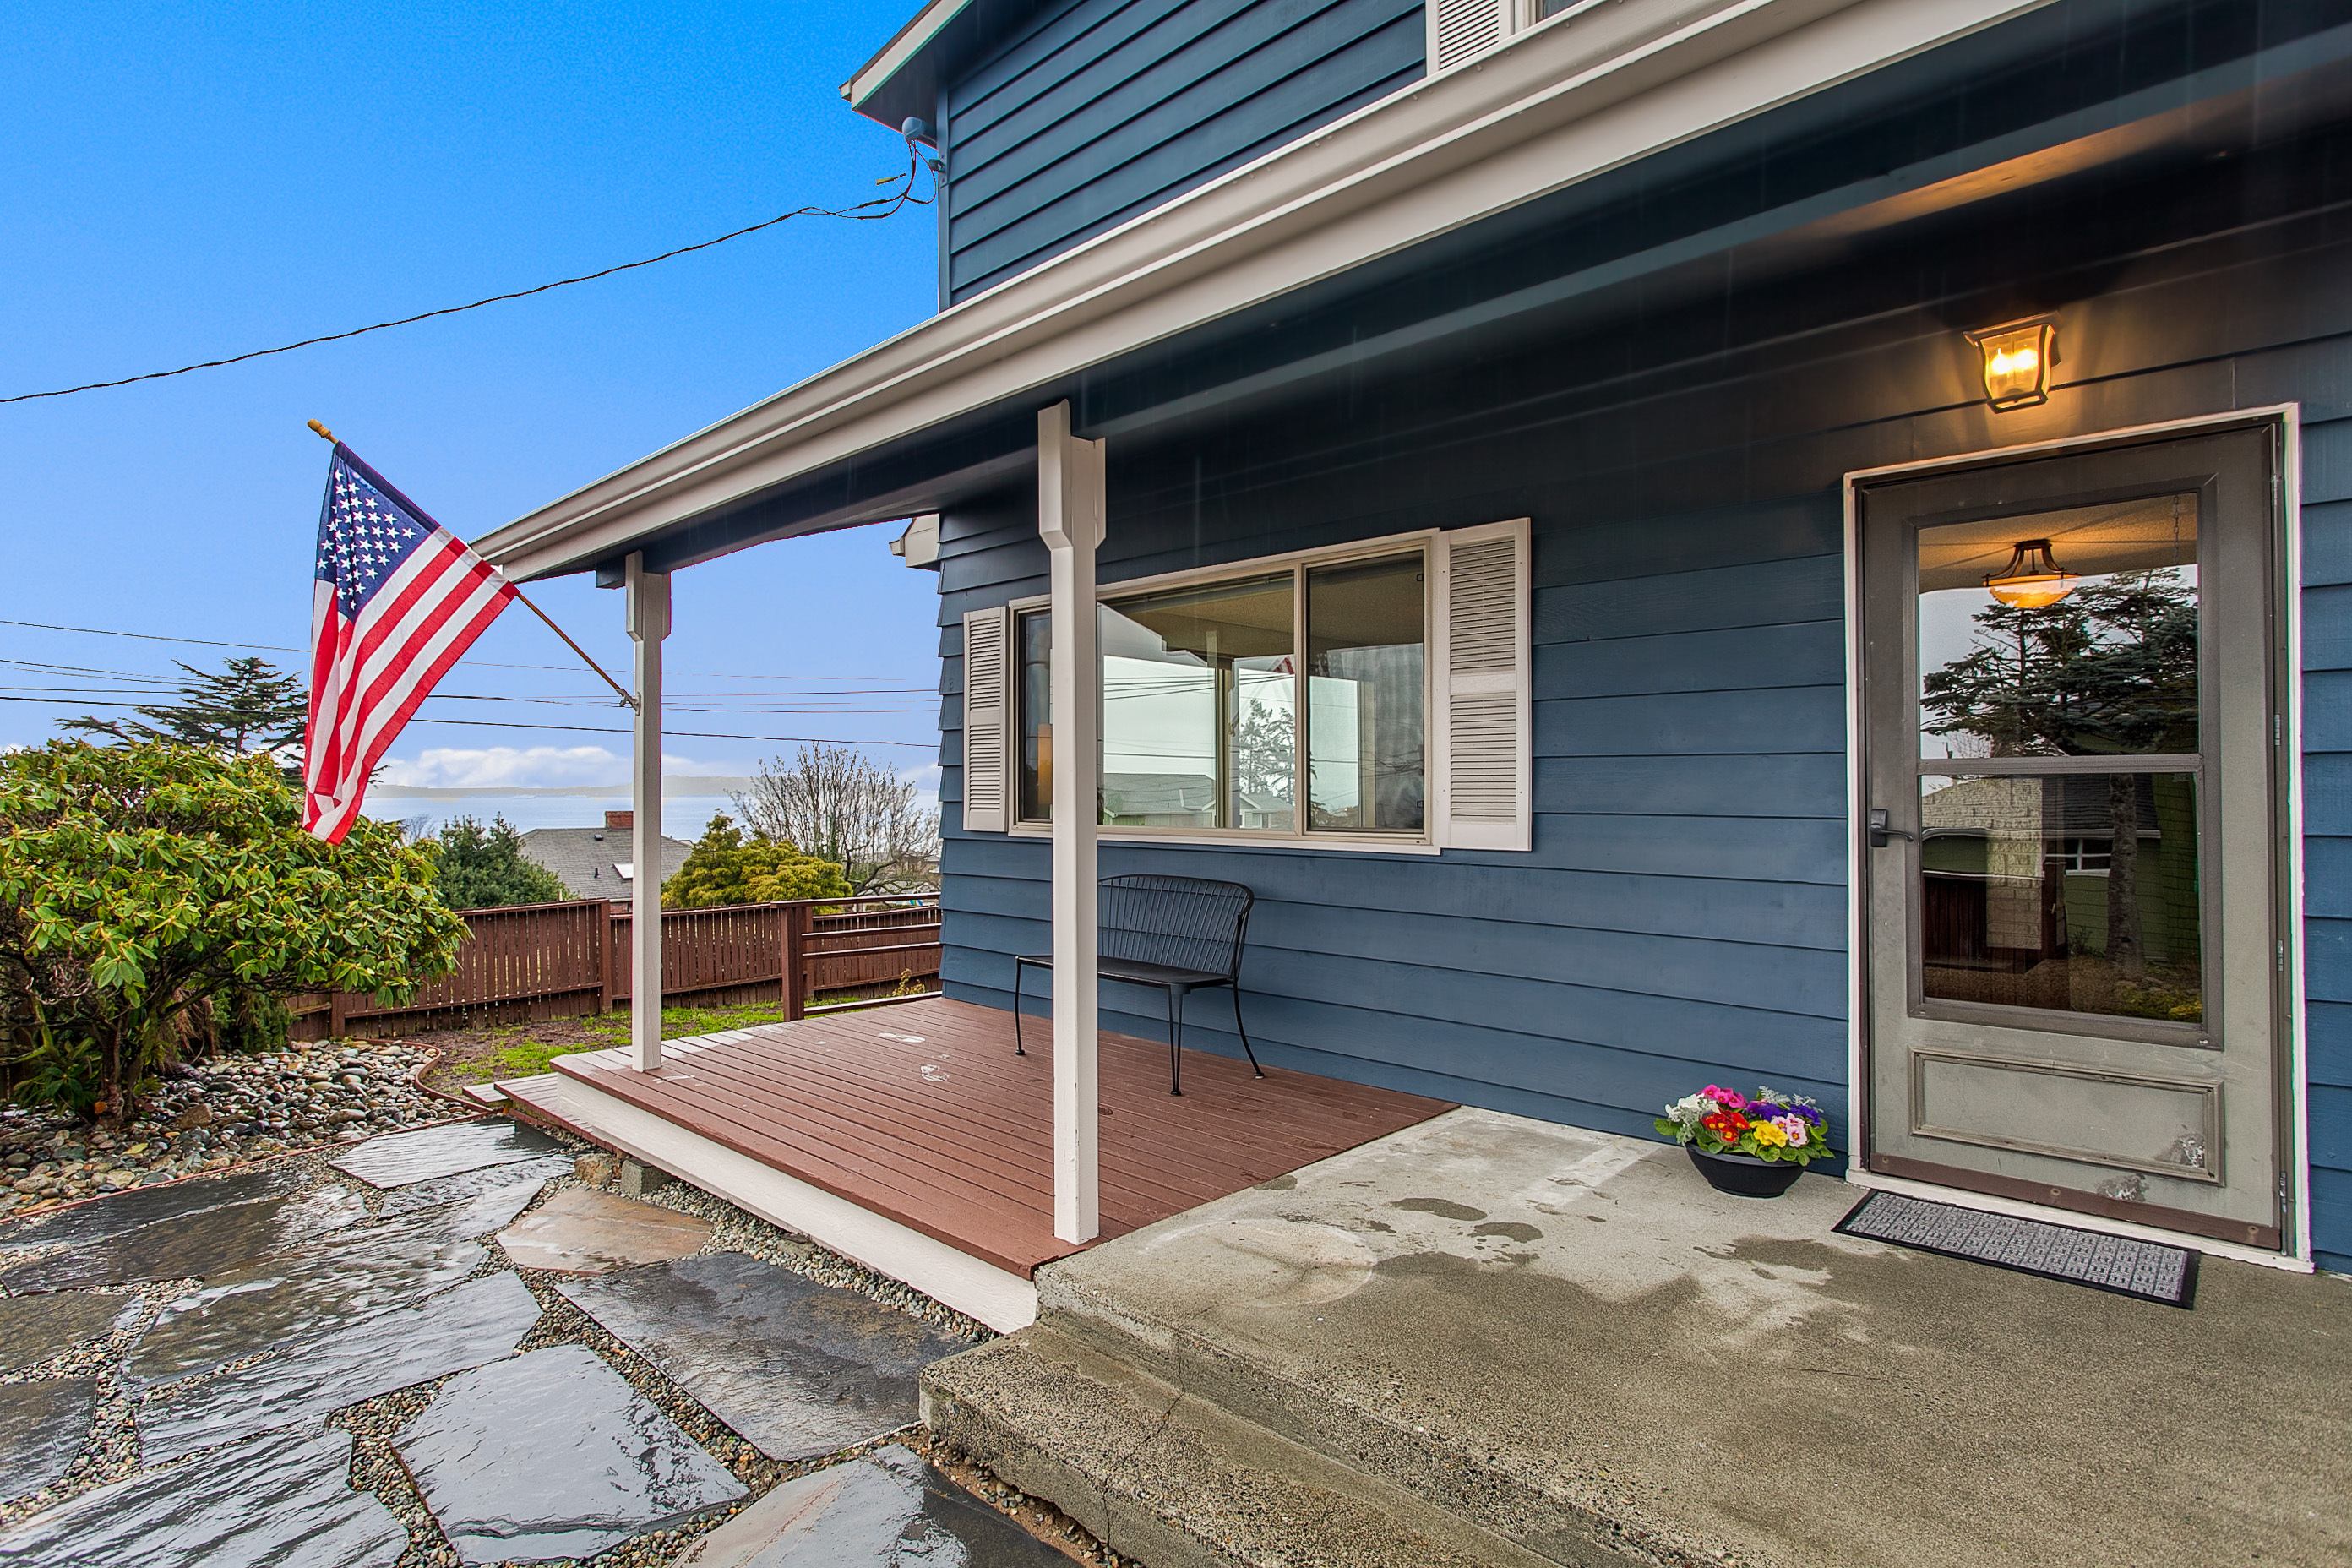 19610 26th Ave Nw, Shoreline, WA - USA (photo 5)